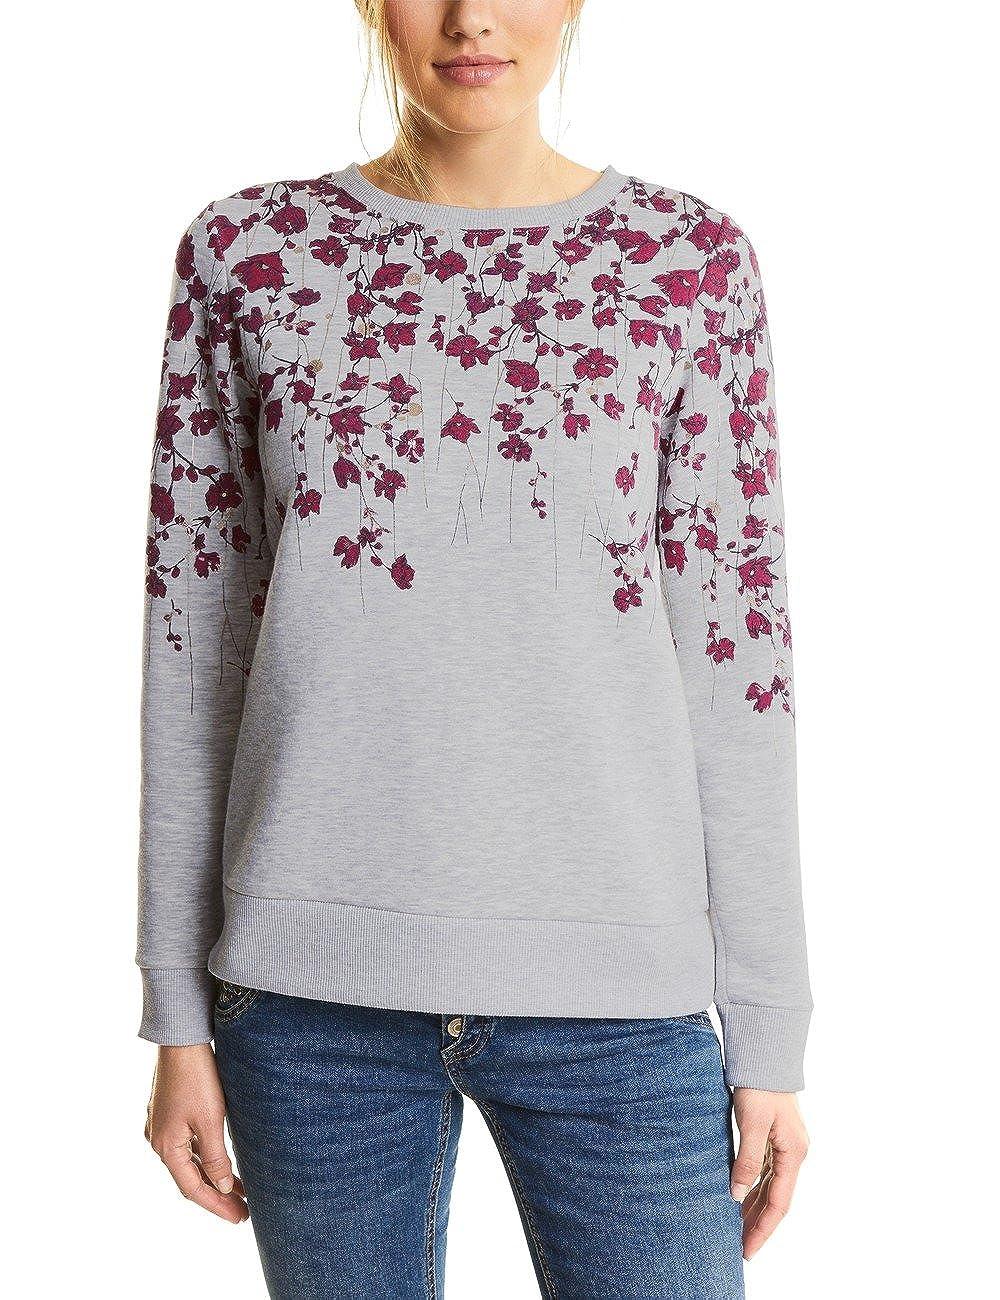 Street One Printed Flower Sweatshirt, Sudadera para Mujer